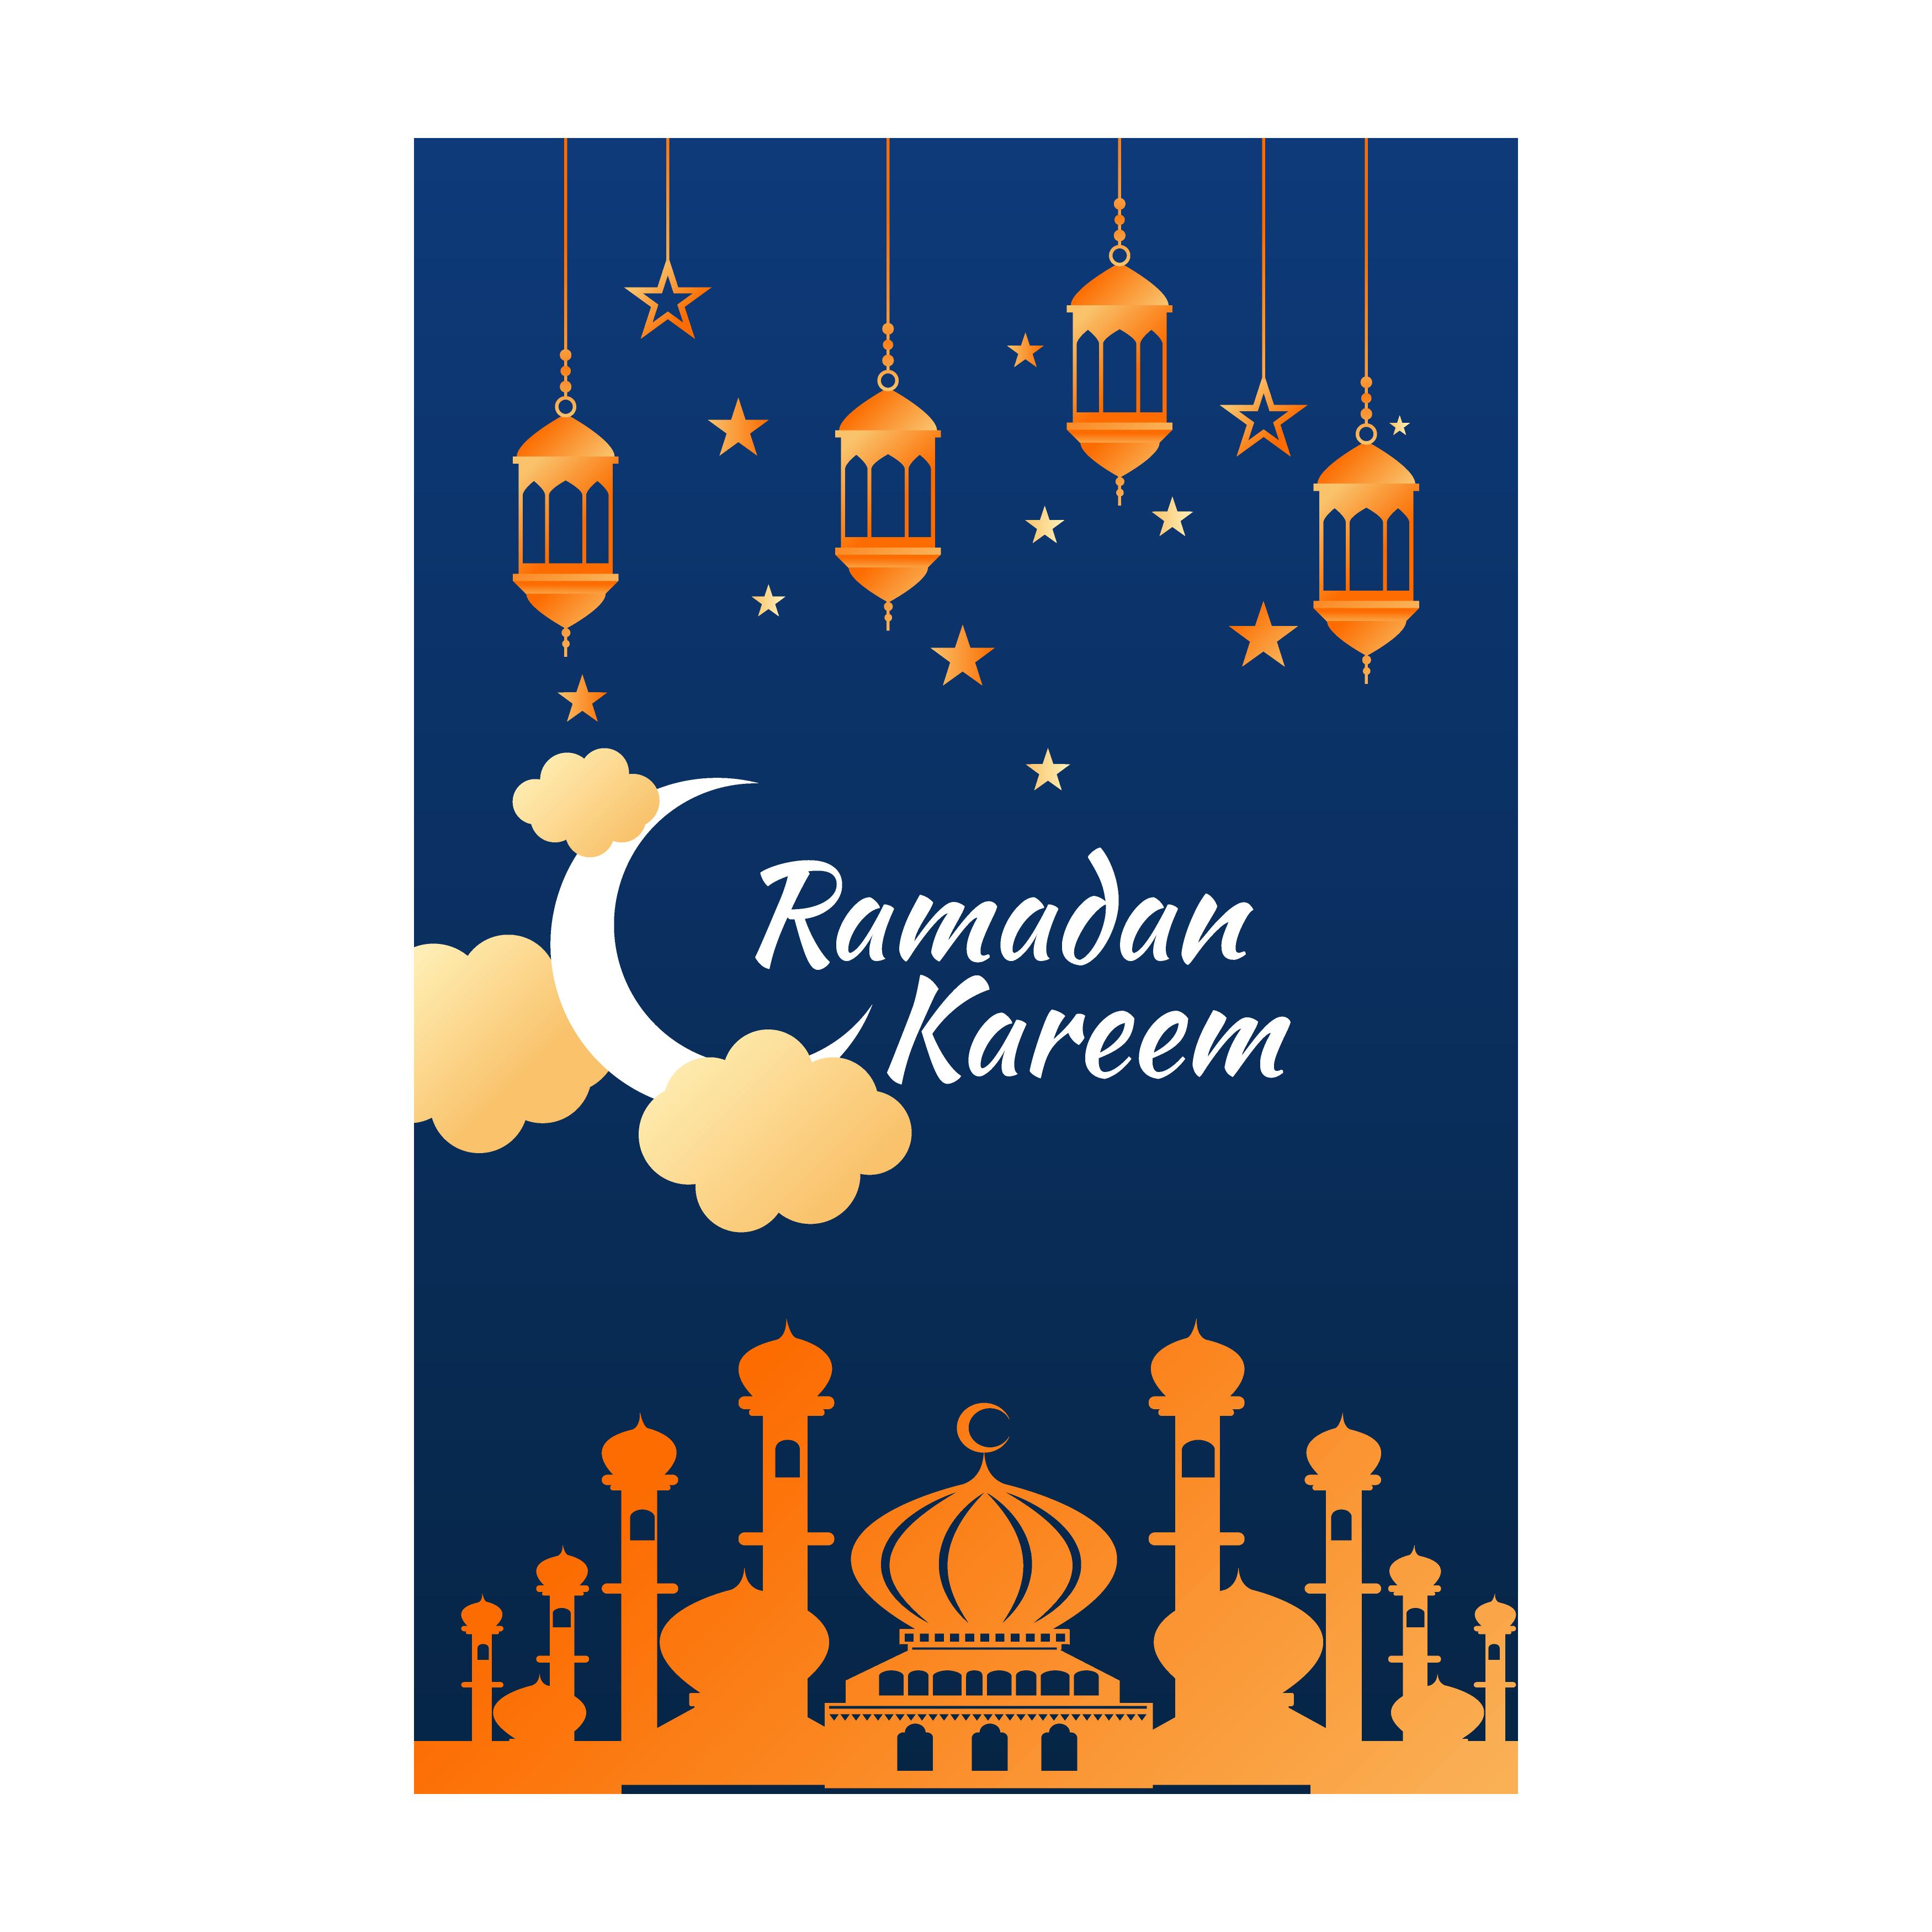 Ramadan Kareem Flyer With Orange Mosque And Lanterns Download Free Vectors Clipart Graphics Vector Art